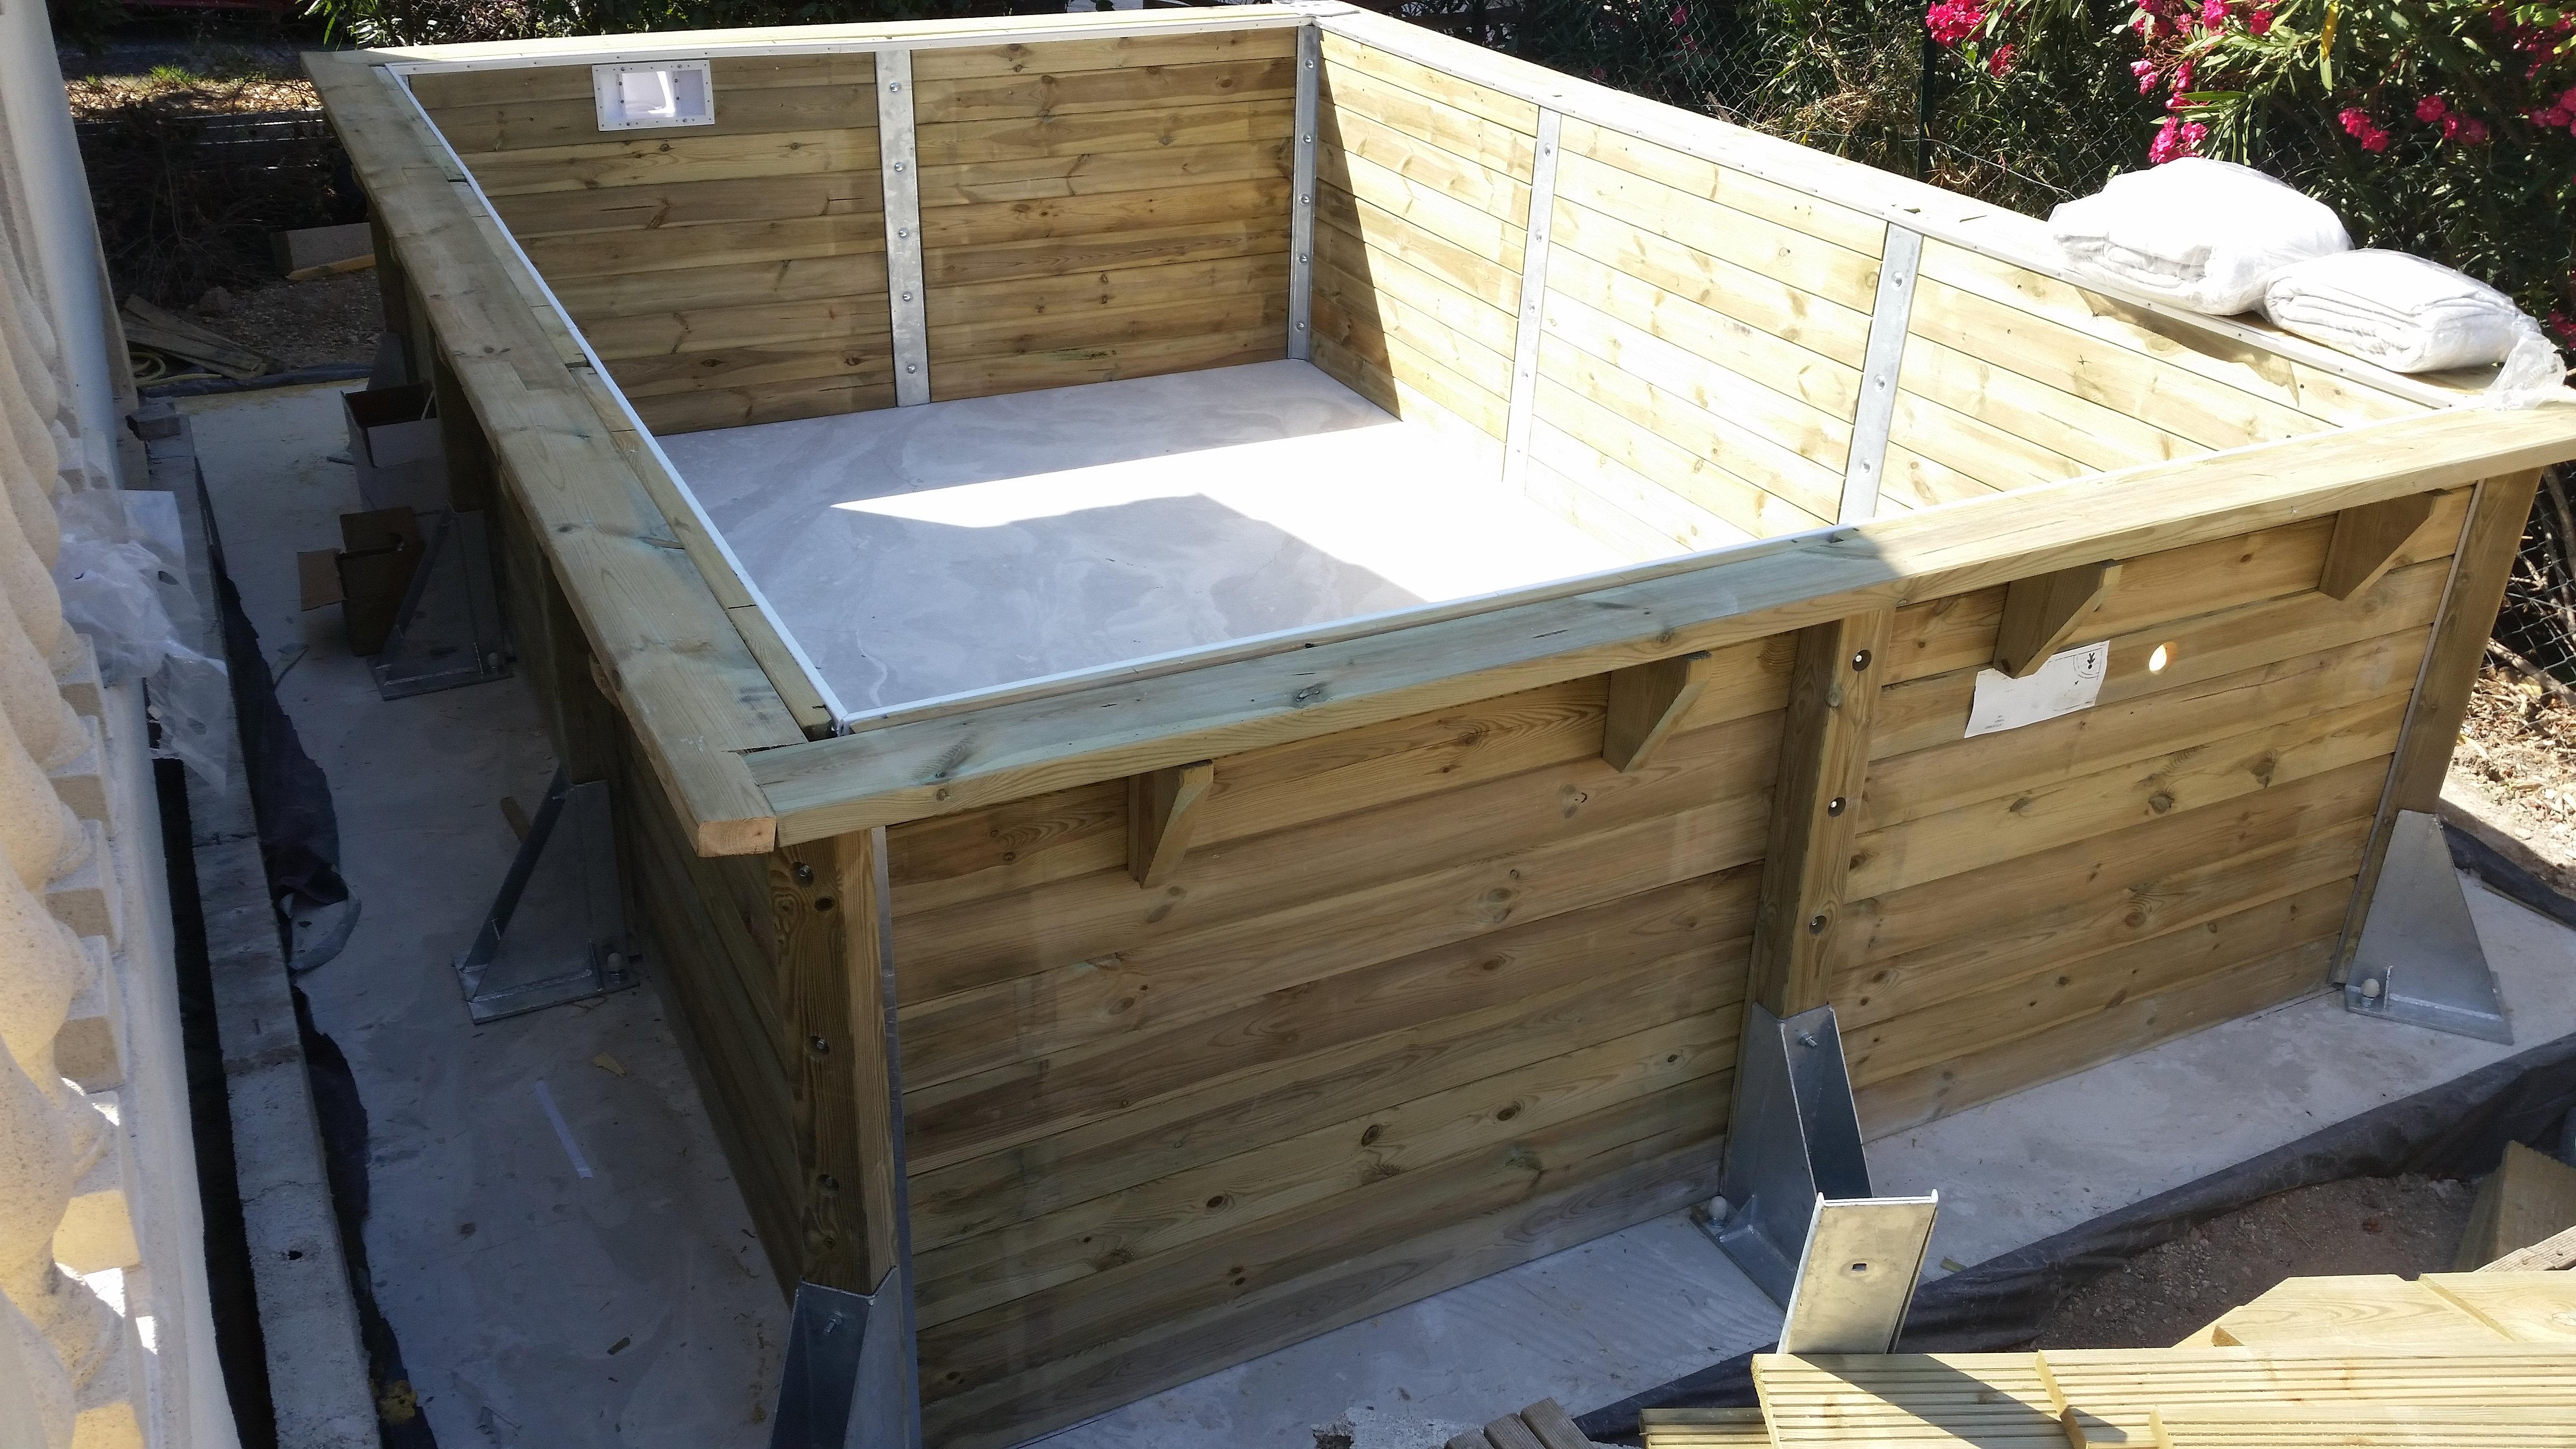 Le service pose montage abri de jardin bois piscine bois piscine hors sol bois detail le - Abri de jardin flovene aixen provence ...